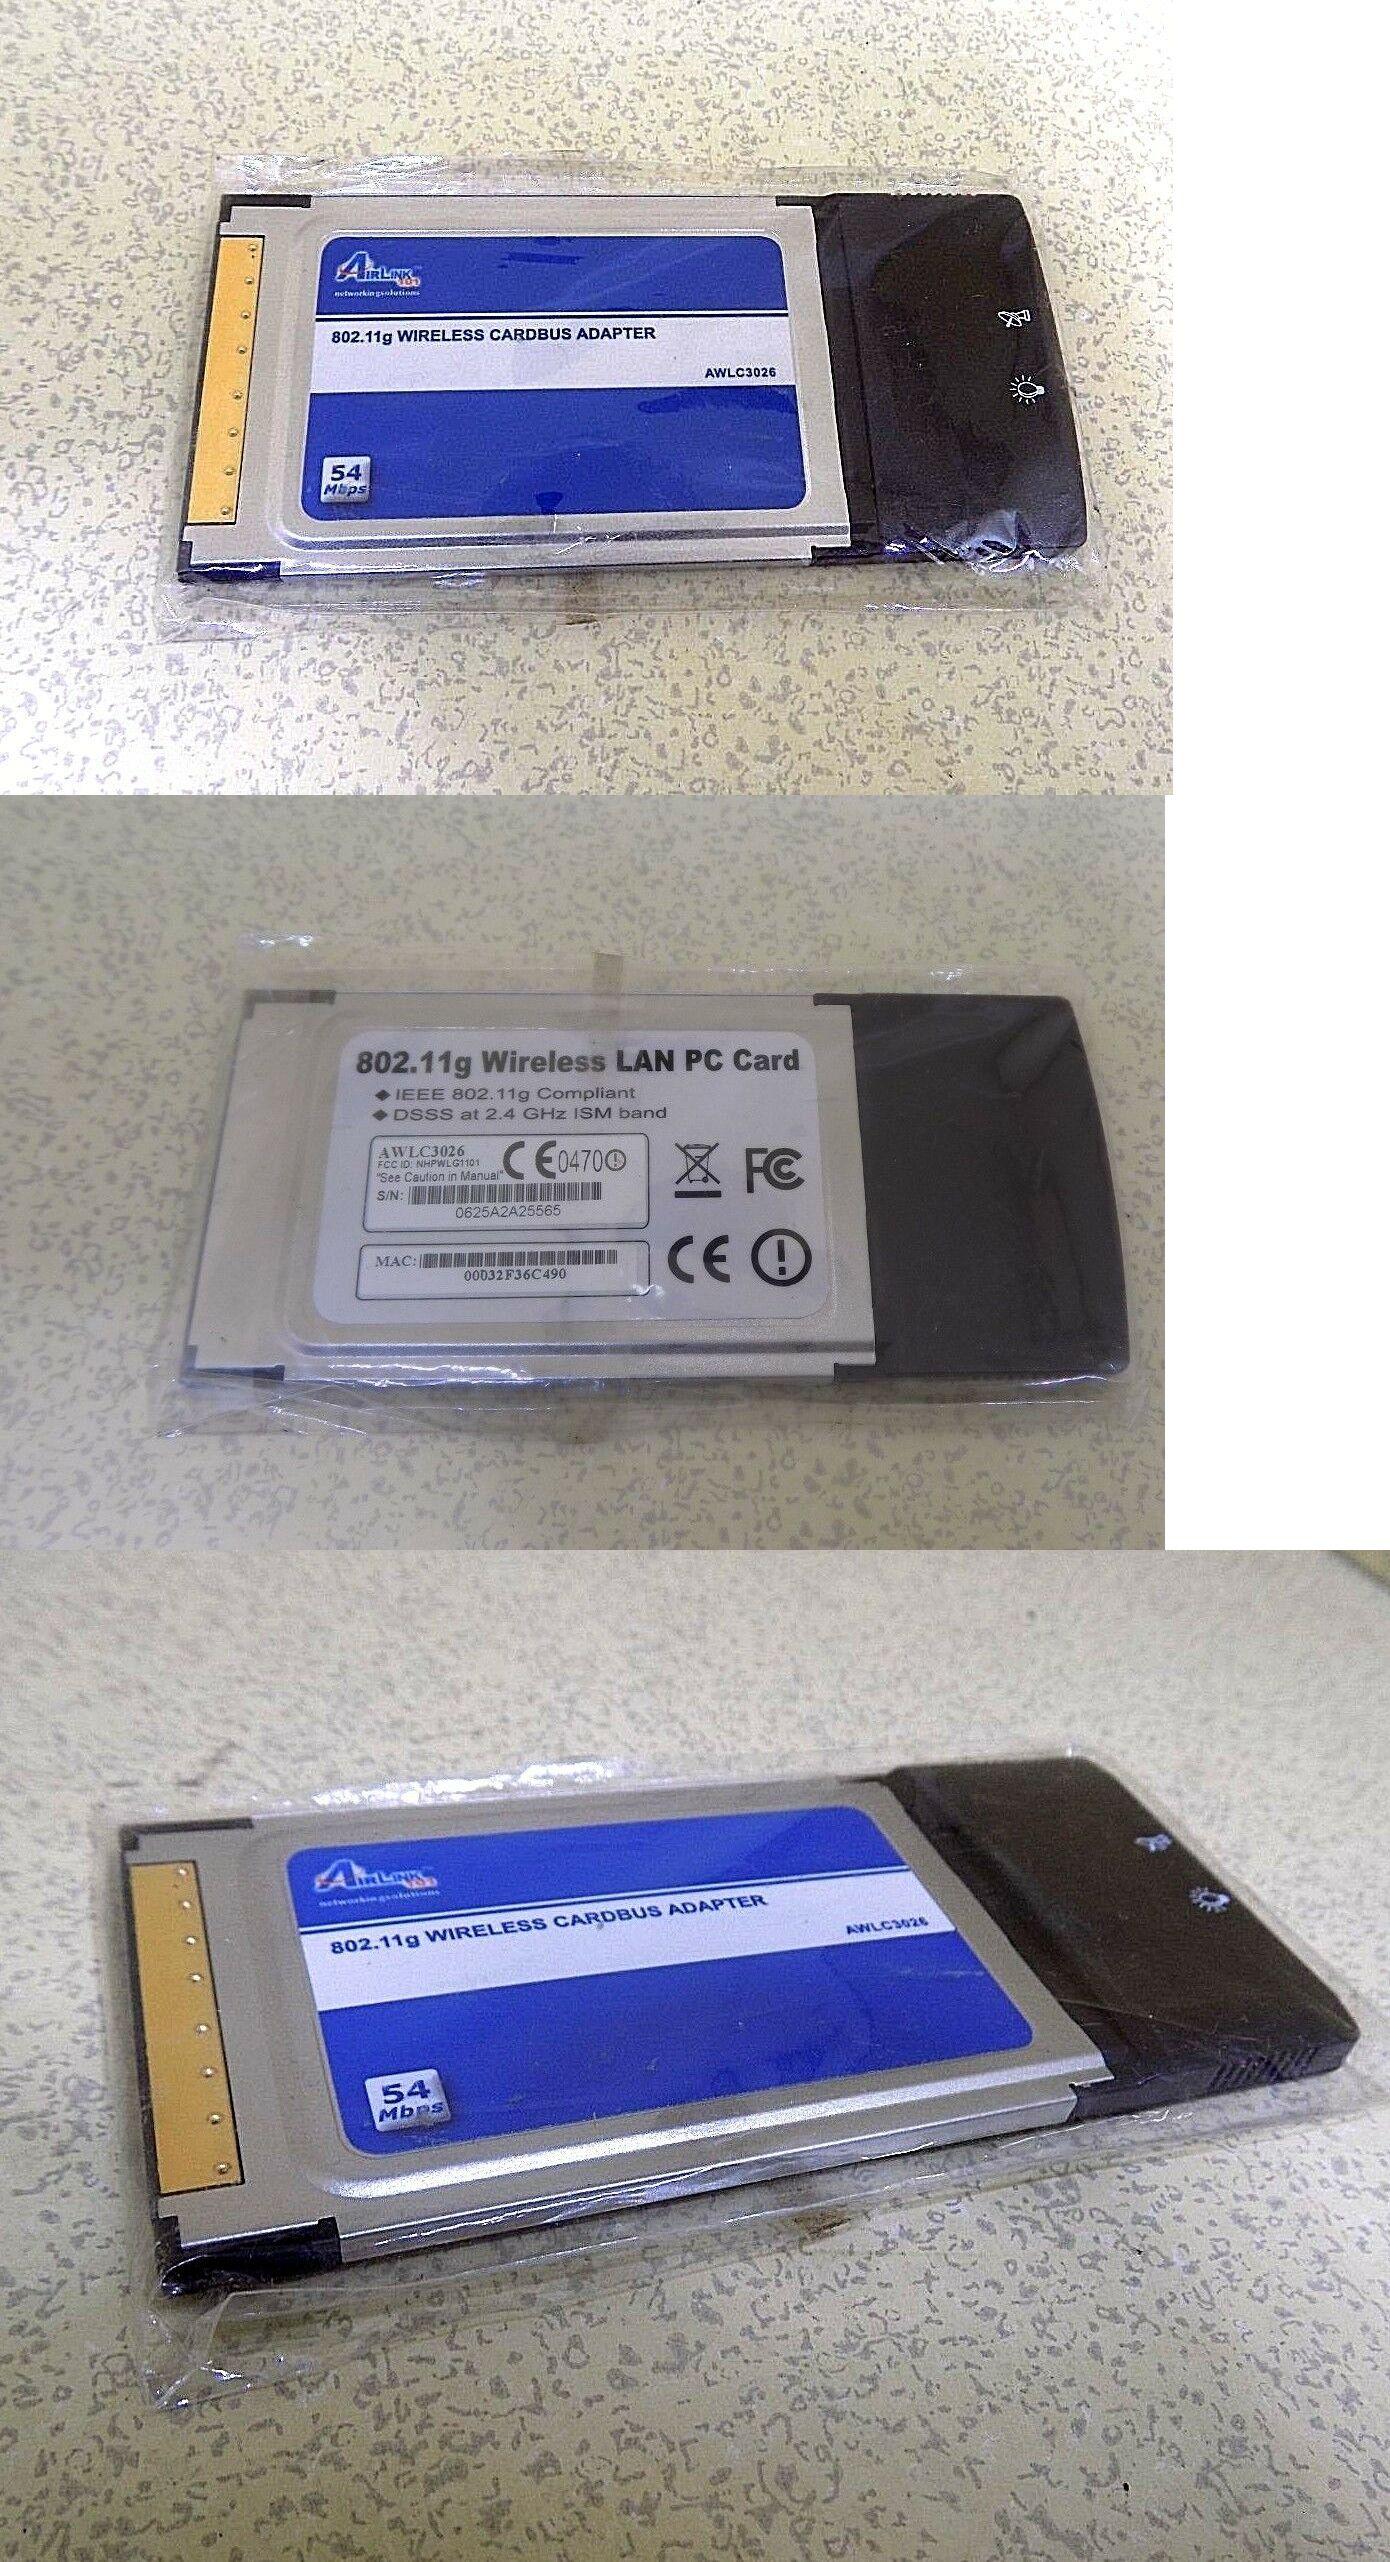 IEEE802.11G WLAN CARDBUS CARD WINDOWS 7 X64 TREIBER